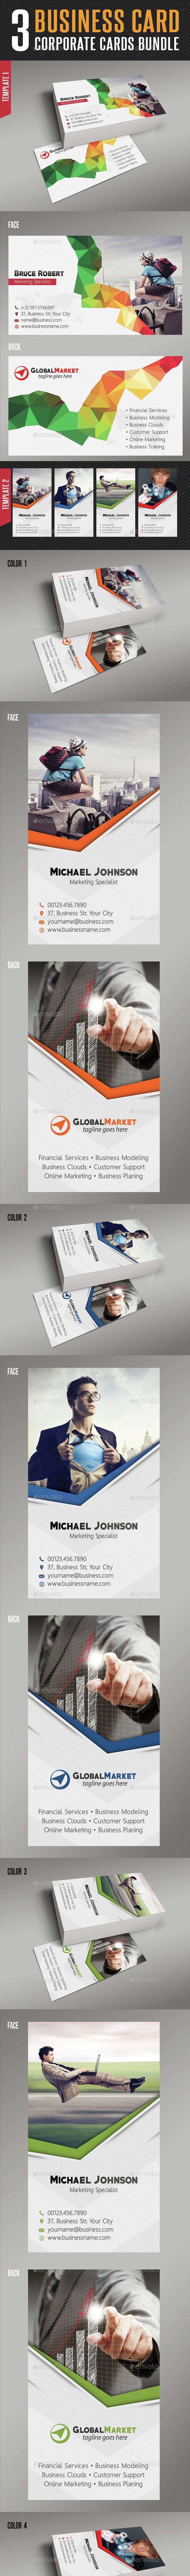 3 in 1 Corporate Business Card Bundle 02 - Corporate Business Cards